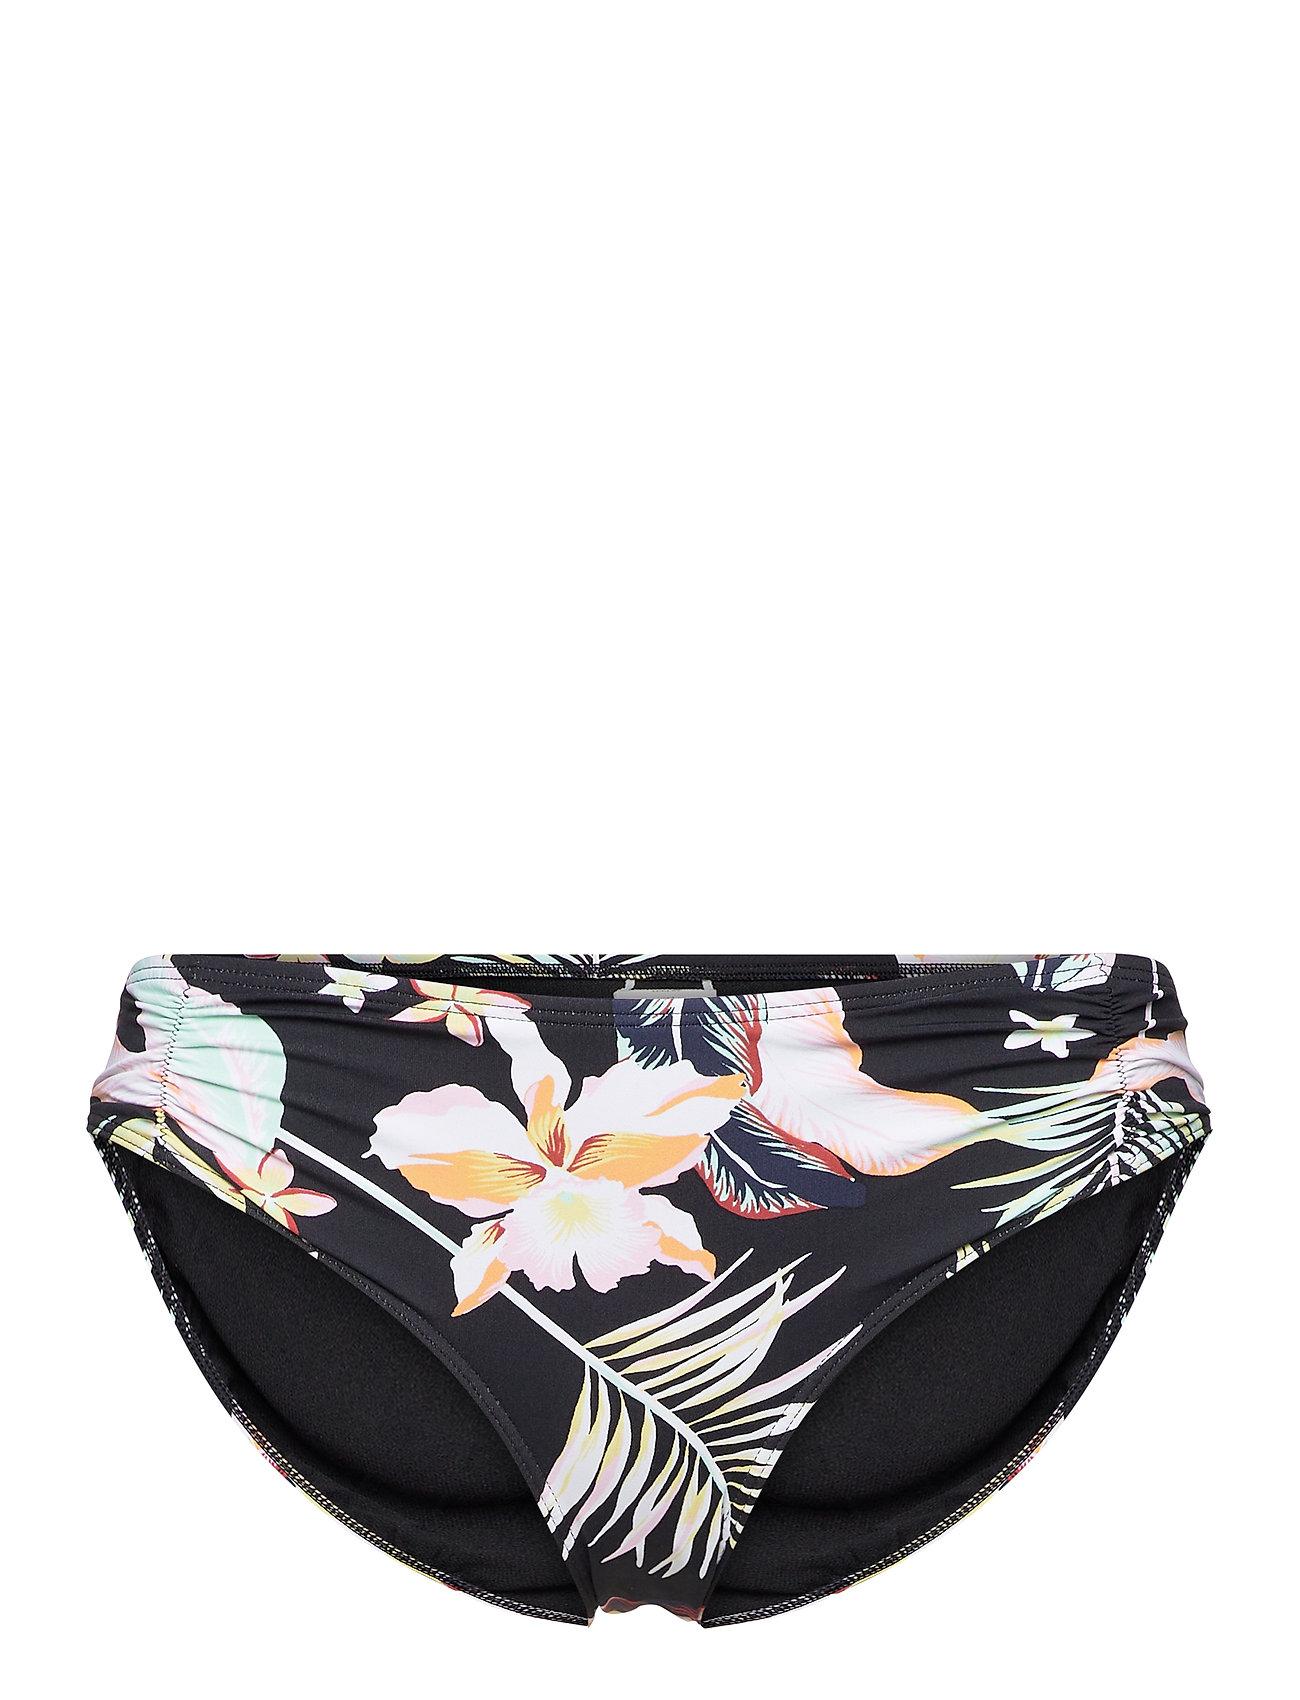 Pt Beach Classics Full Bottom Bikinitrusser Sort Roxy